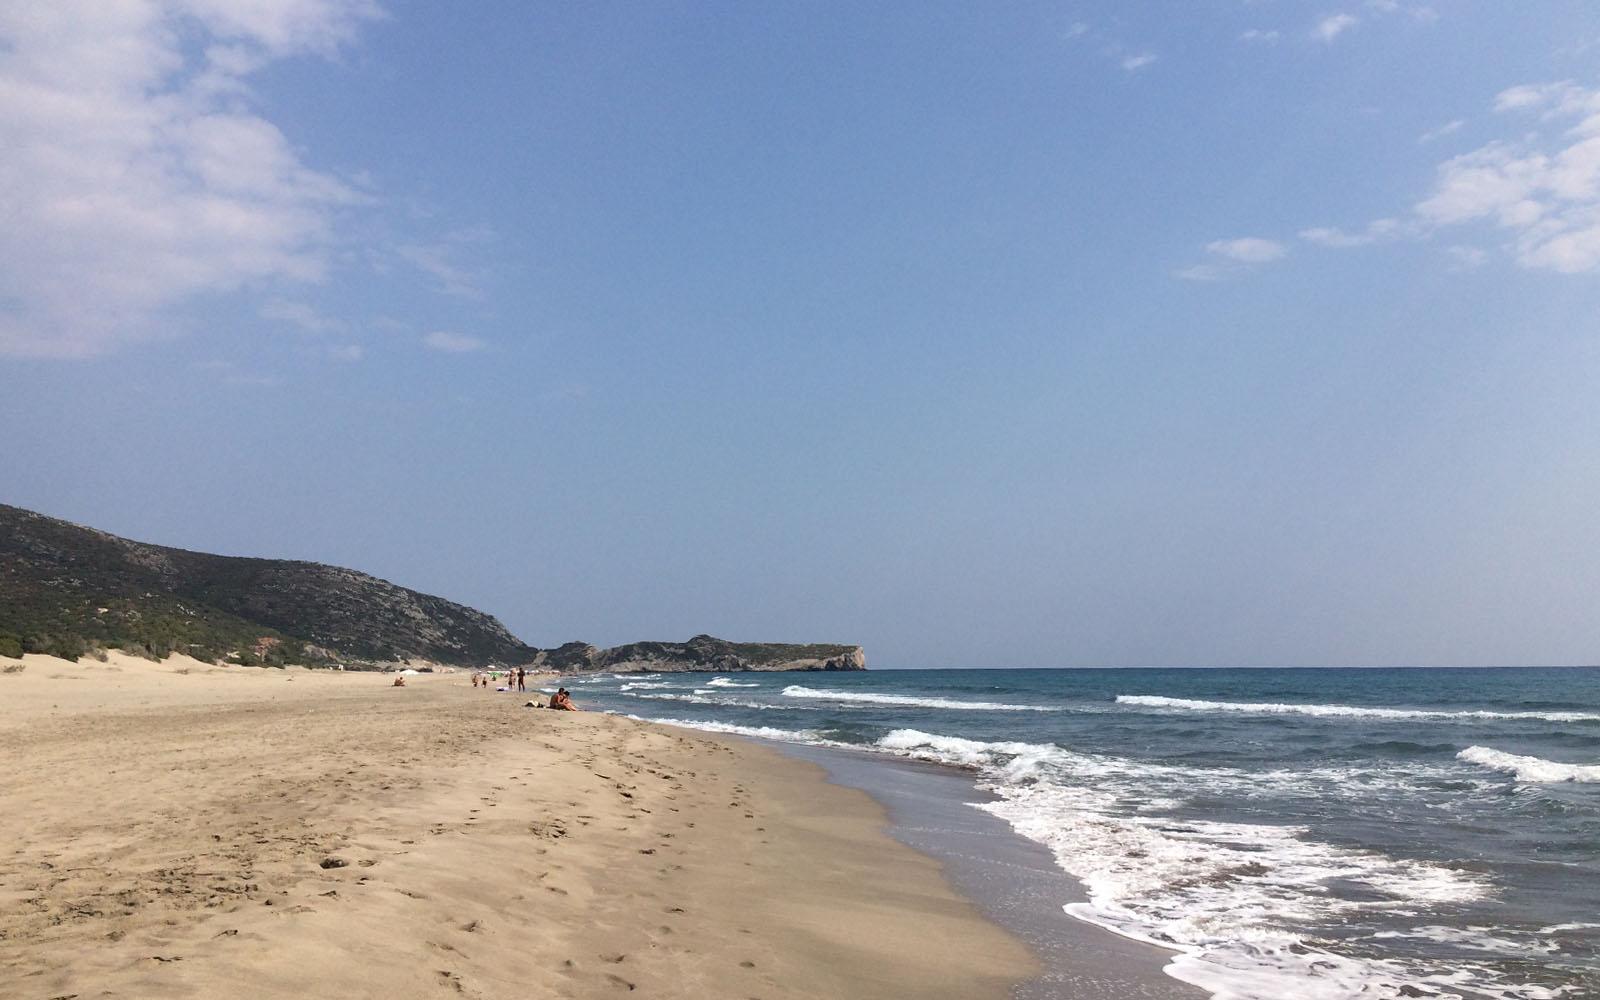 L'affascinante spiaggia di Patara, in Turchia.